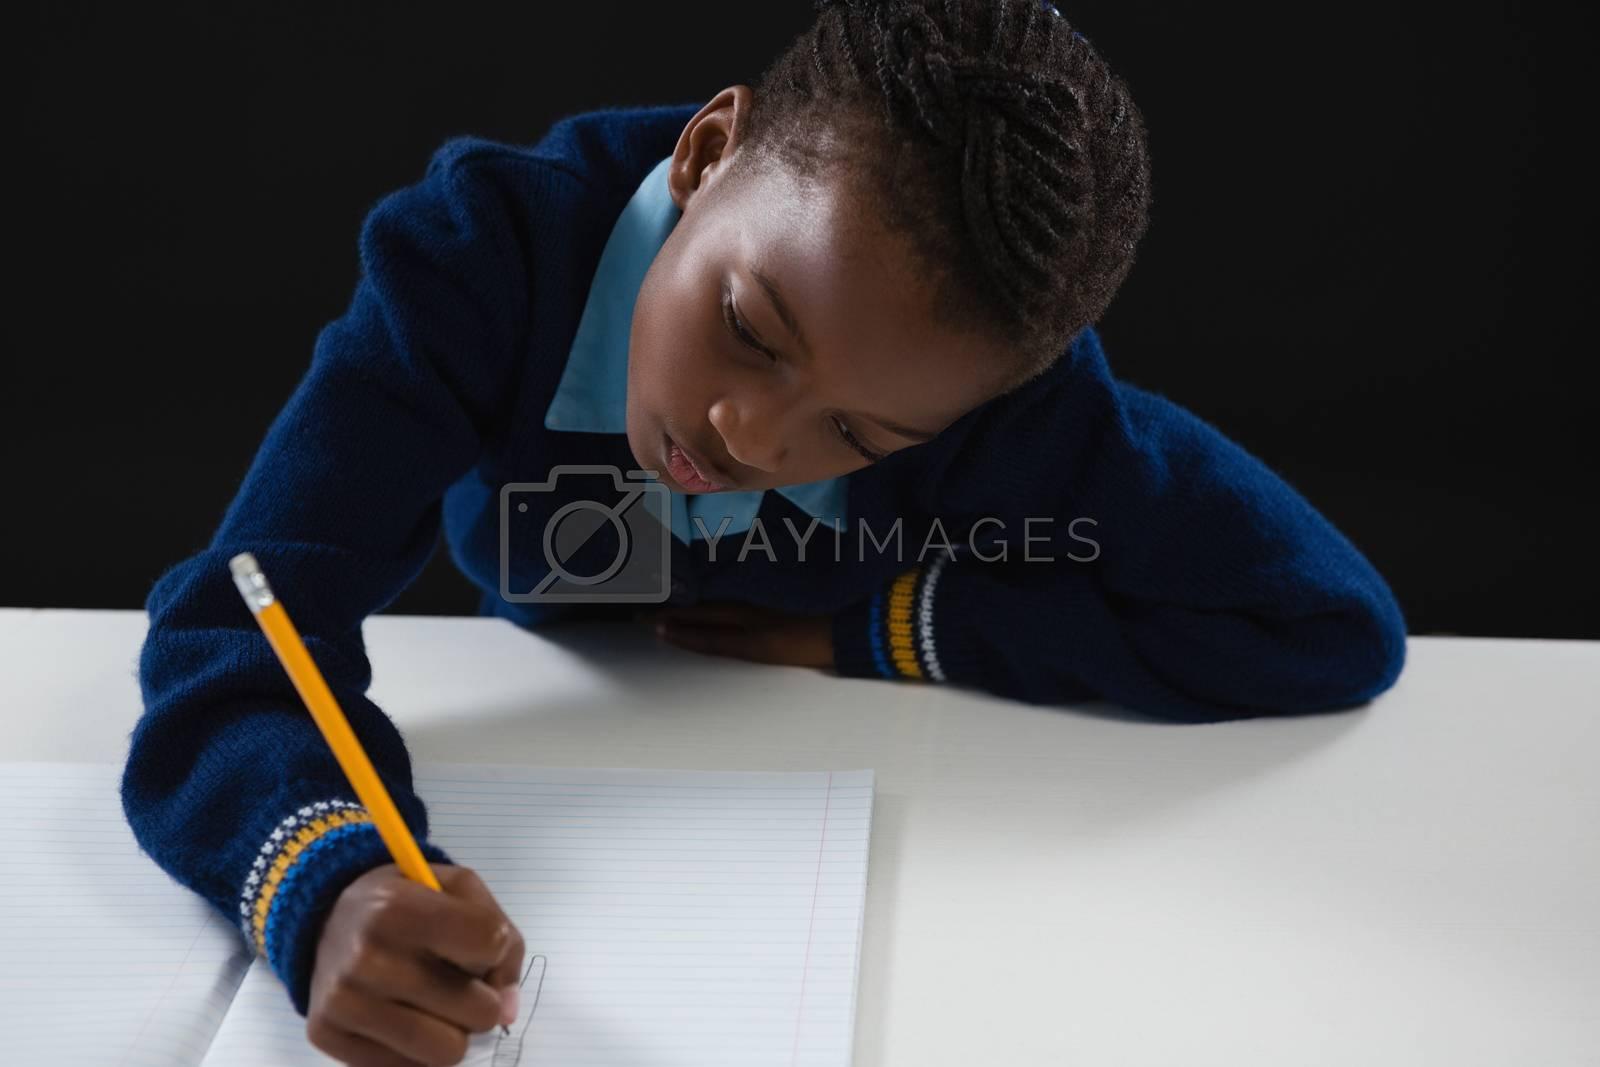 Schoolgirl doing his homework against black background by Wavebreakmedia